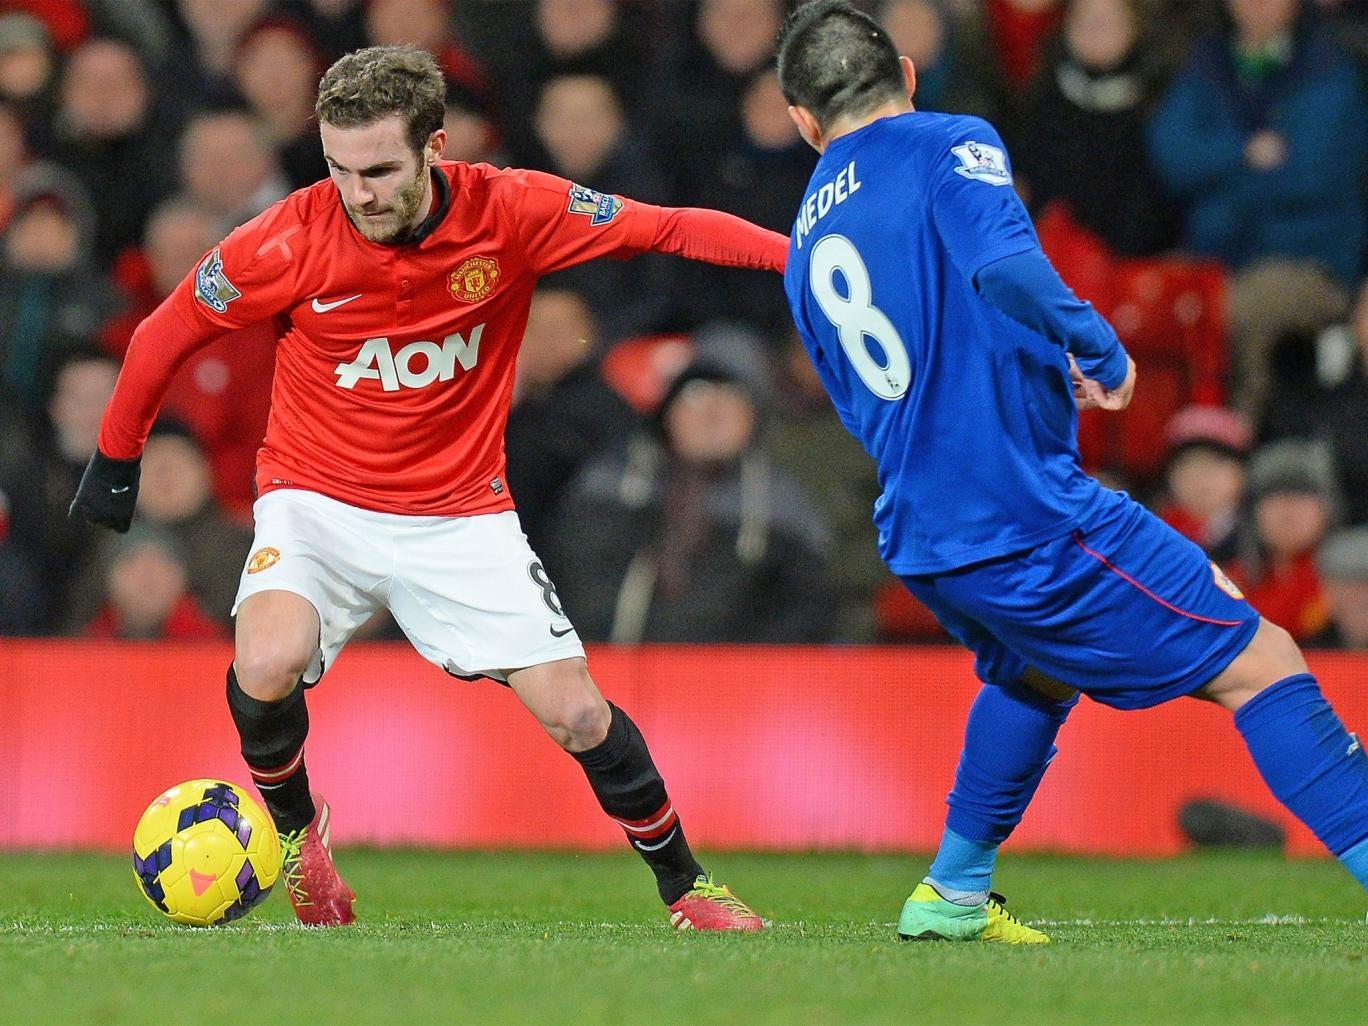 Juan Mata made an impressive debut for Manchester United